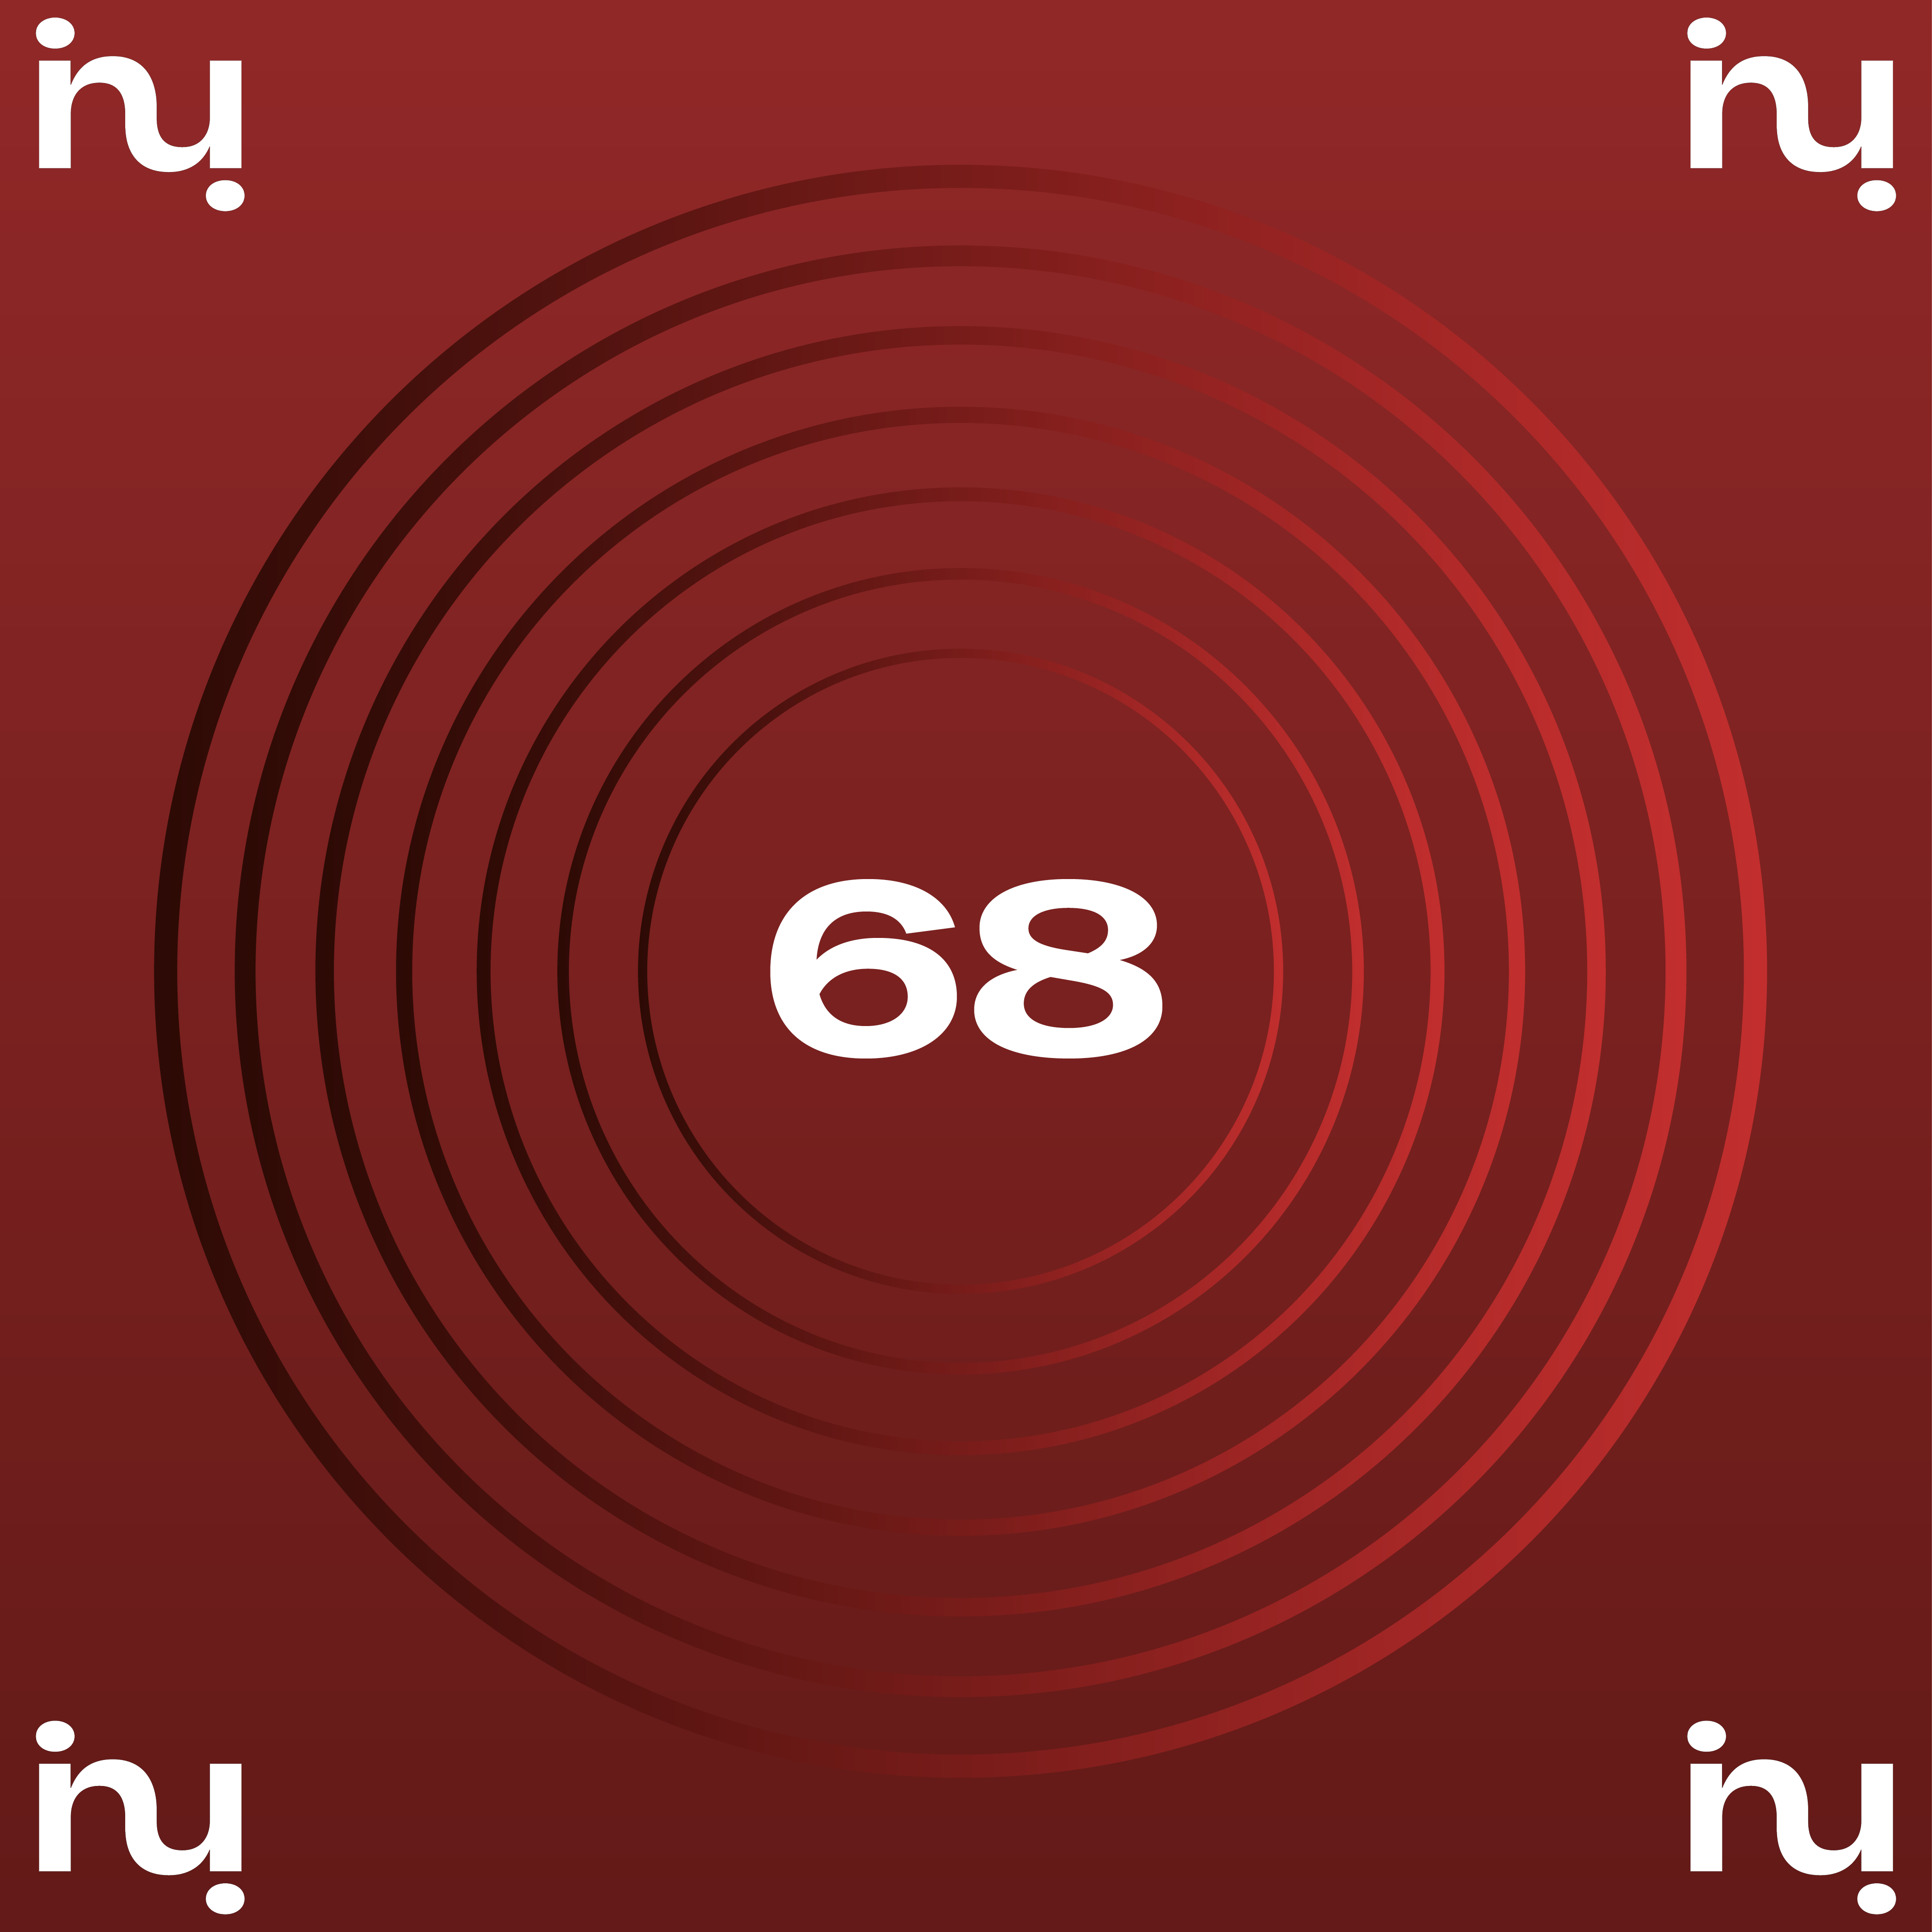 LISTENUP_PLAYLIST #68